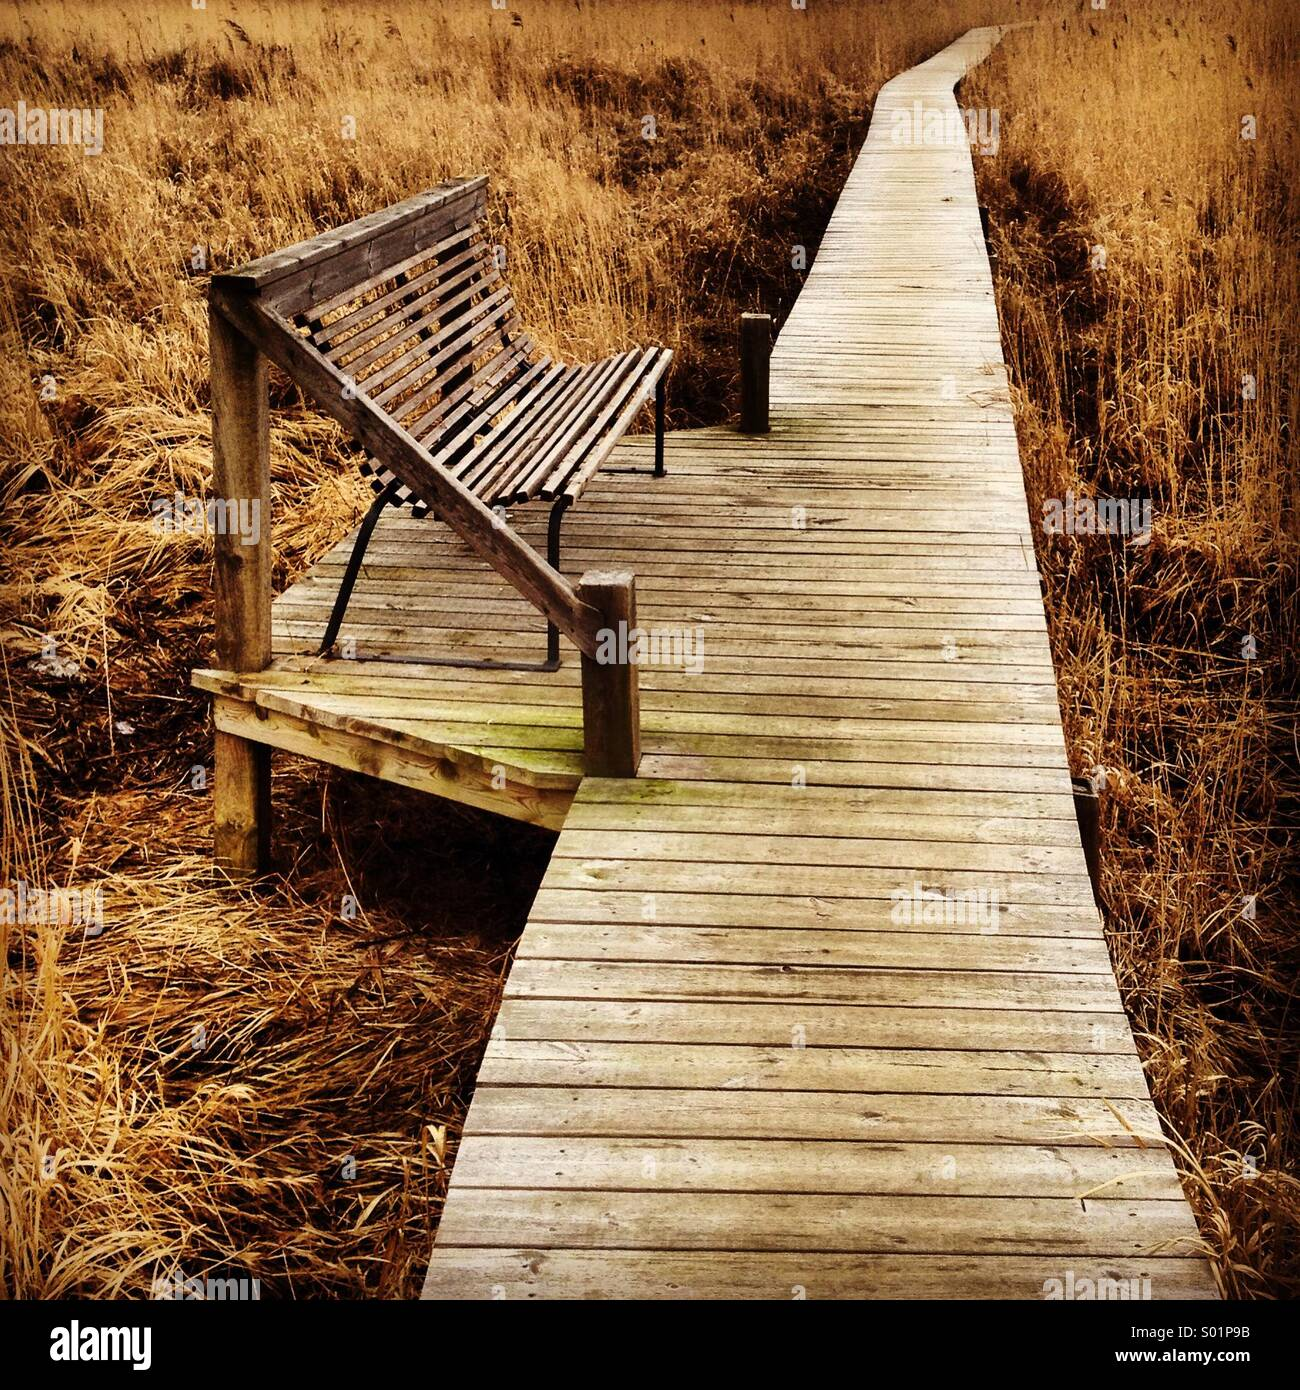 Un solo banco vacía sobre una pasarela sobre seaside cañas en Escandinavia Imagen De Stock